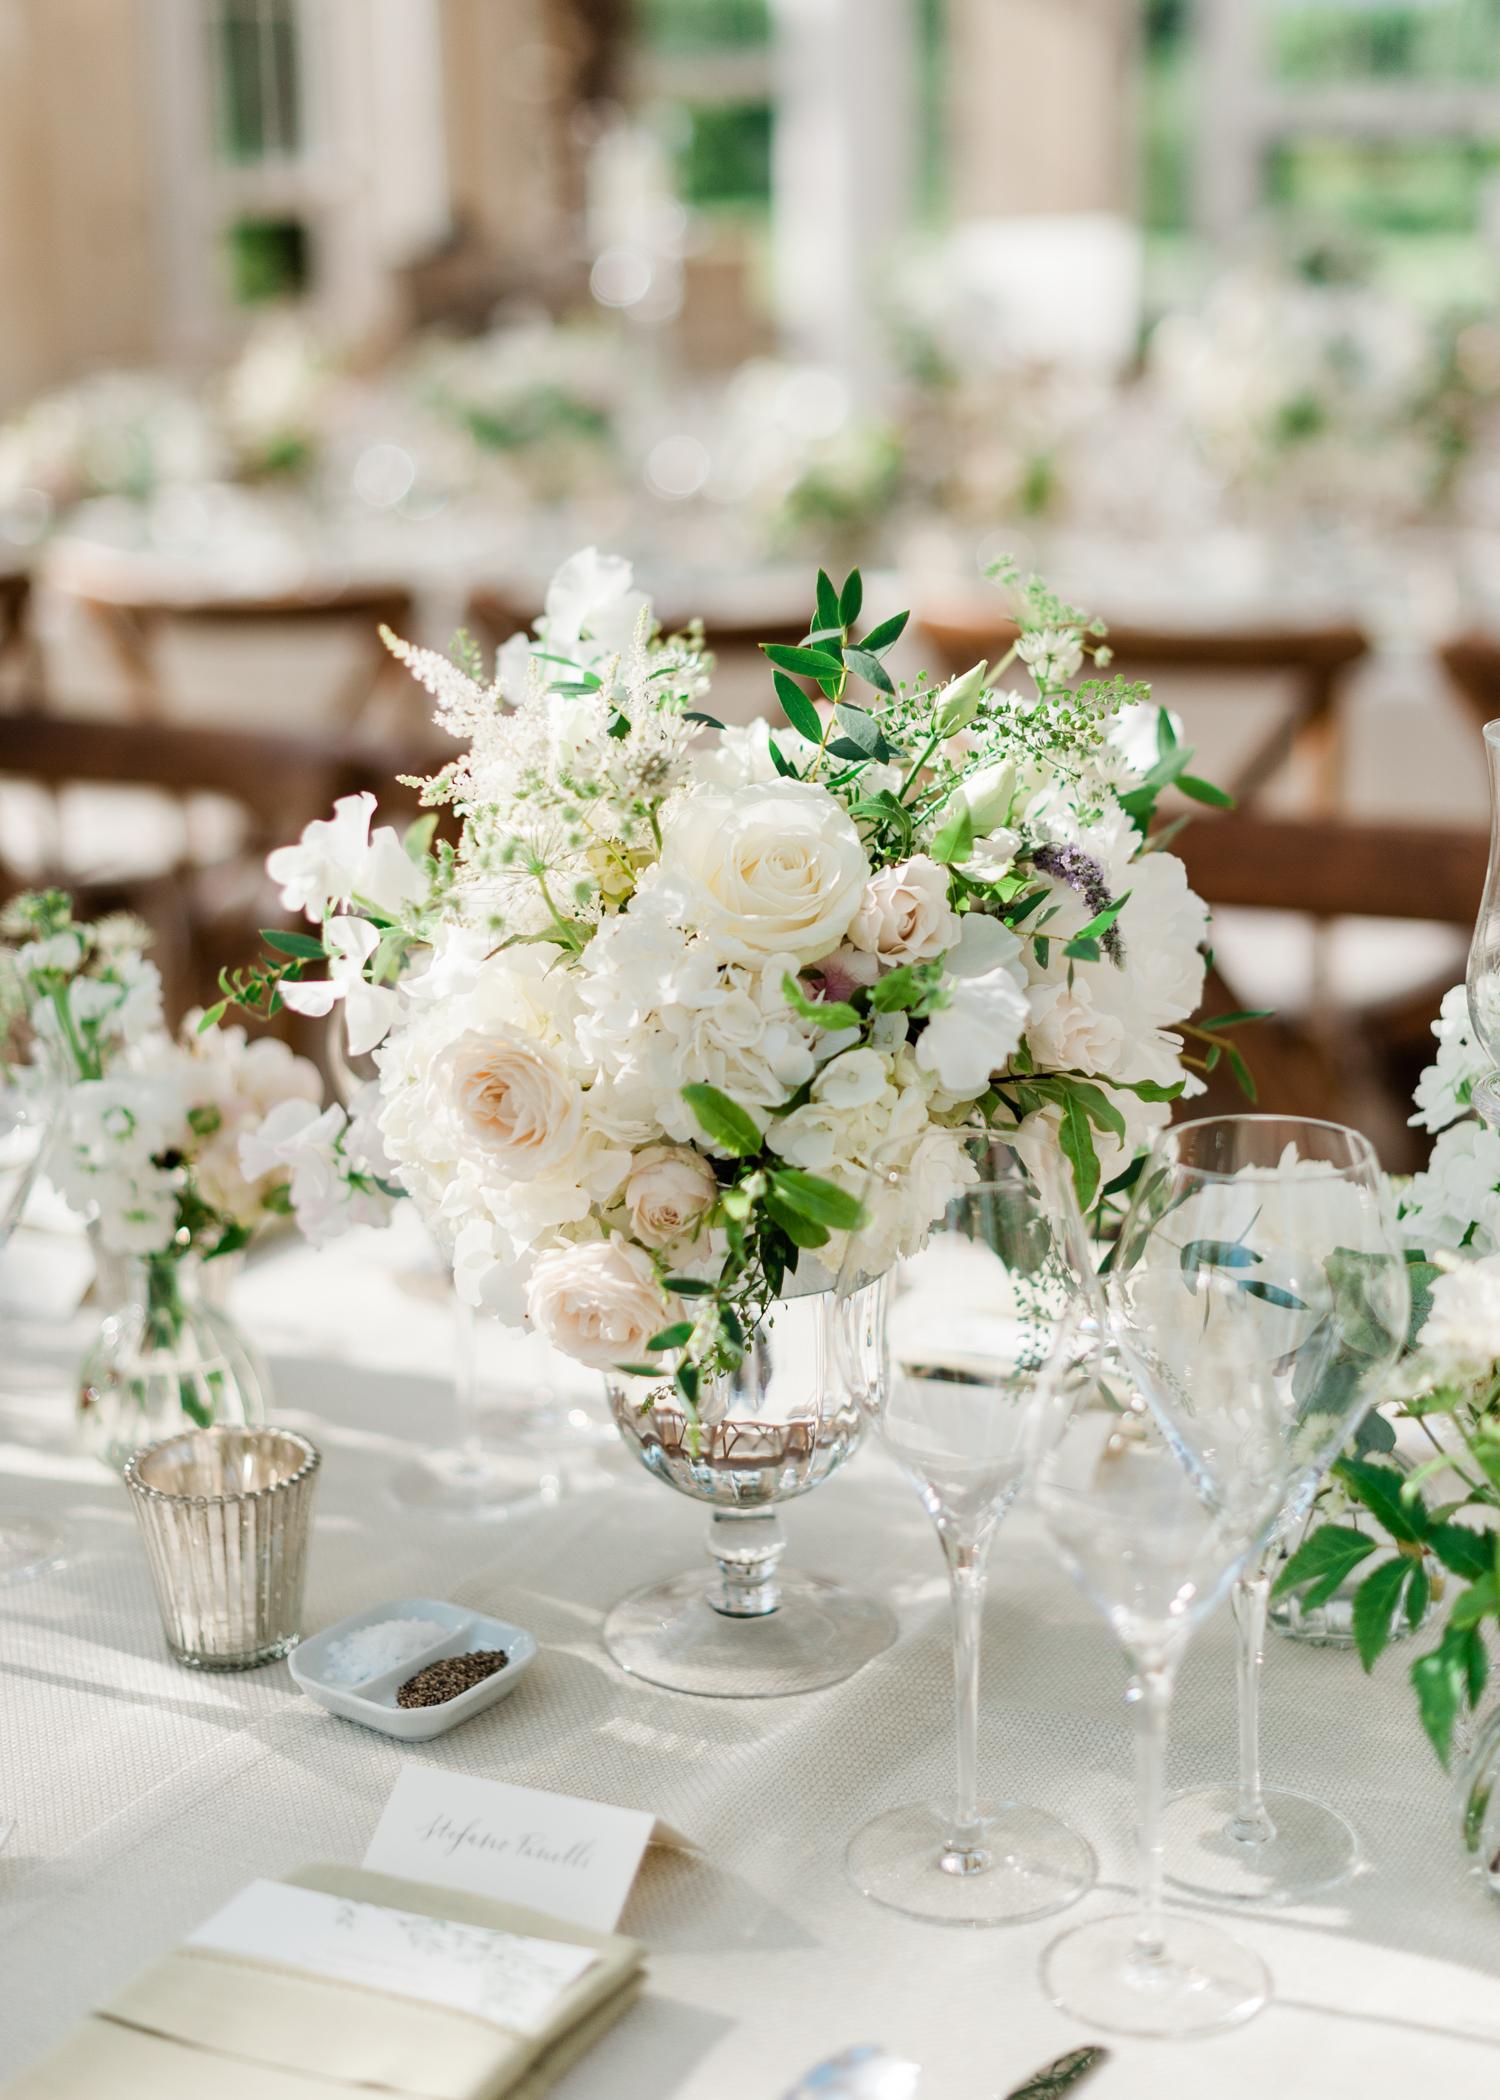 Littleton-Rose-Syon-House-London-Wedding-Planner-floral-urn.jpg